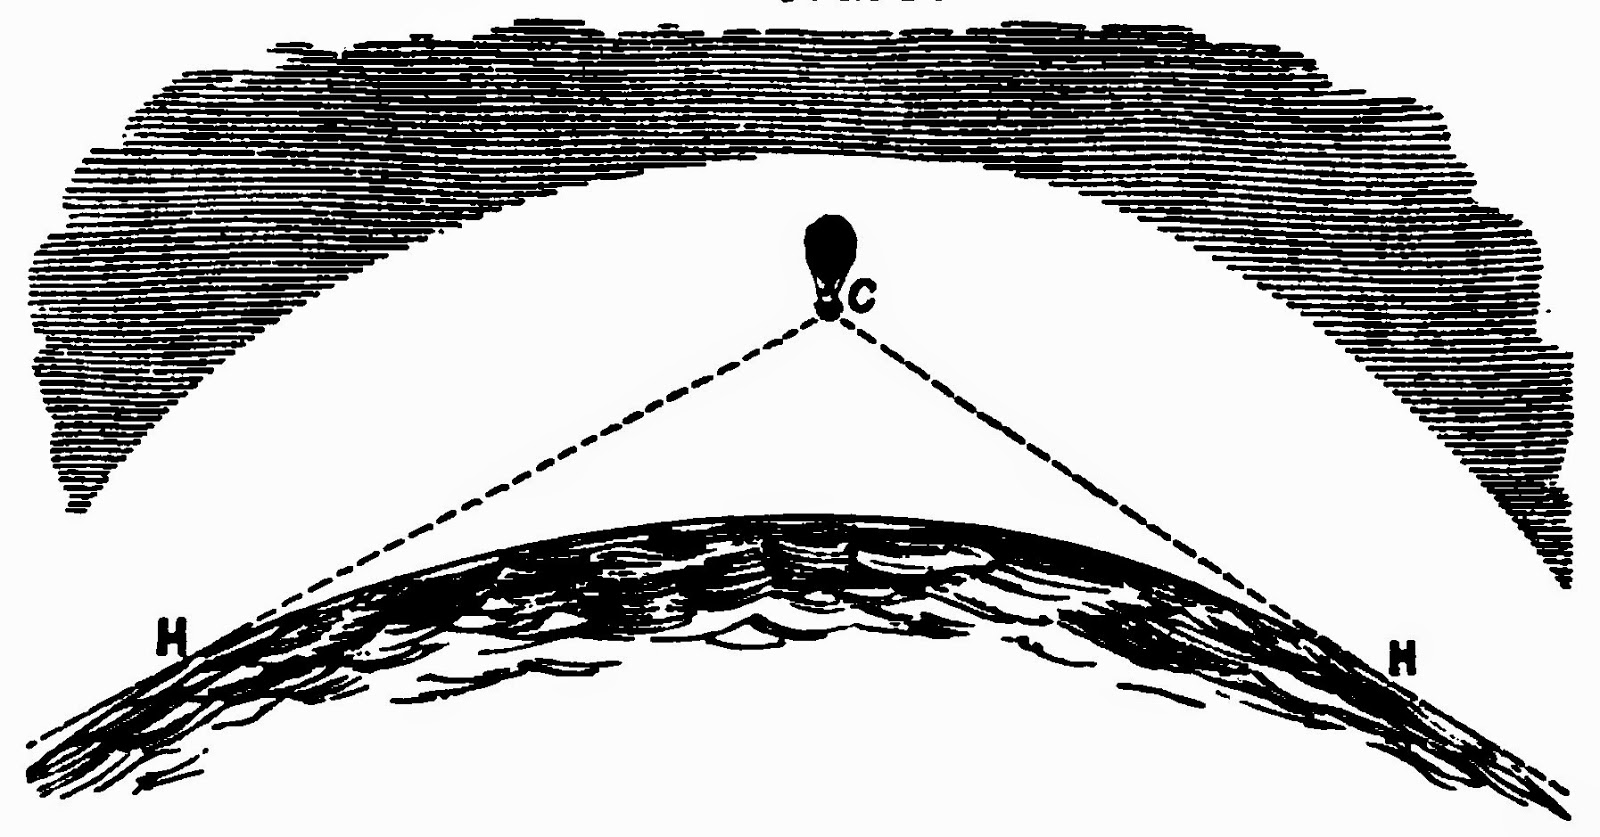 Line Art Earth : The always horizontal horizon proves earth flat